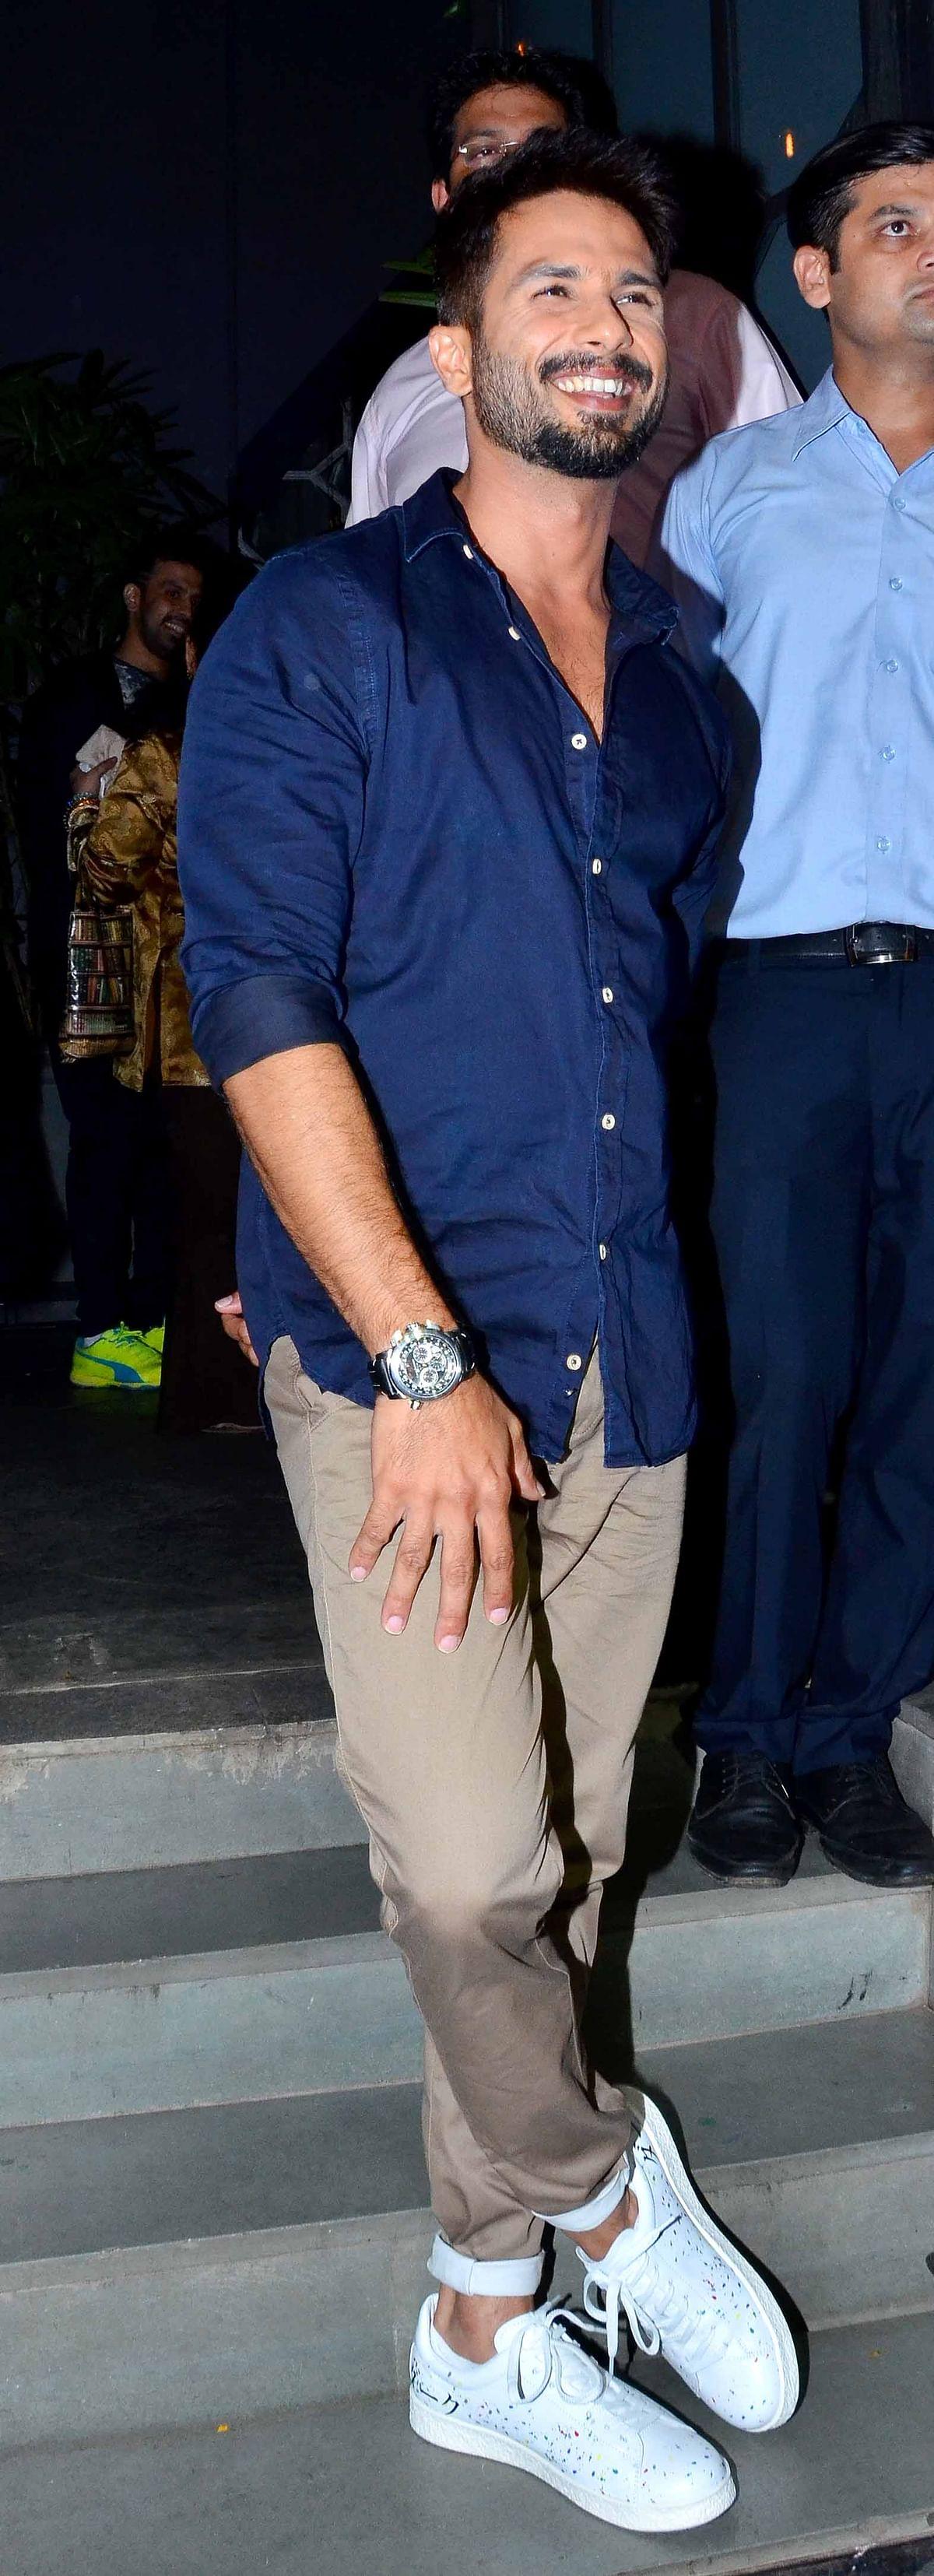 Shahid Kapoor looking as dashing as ever. (Photo: Yogen Shah)